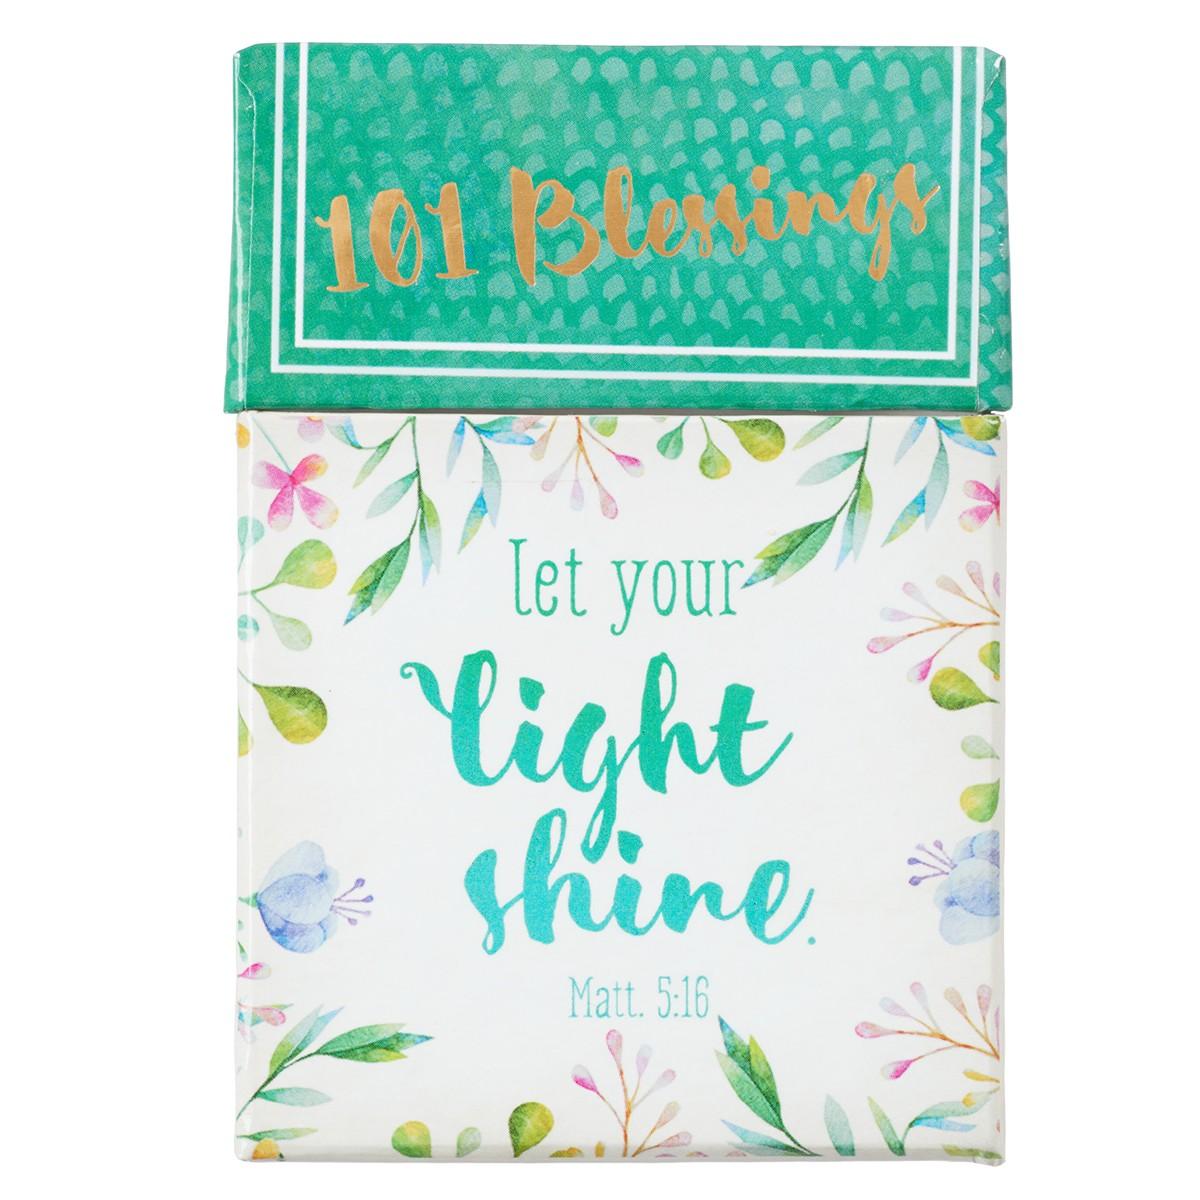 Wood Boxes With Sayings Let Your Light Shine  \u2013 Bible Verse Box \u2013 Decorative Storage Box